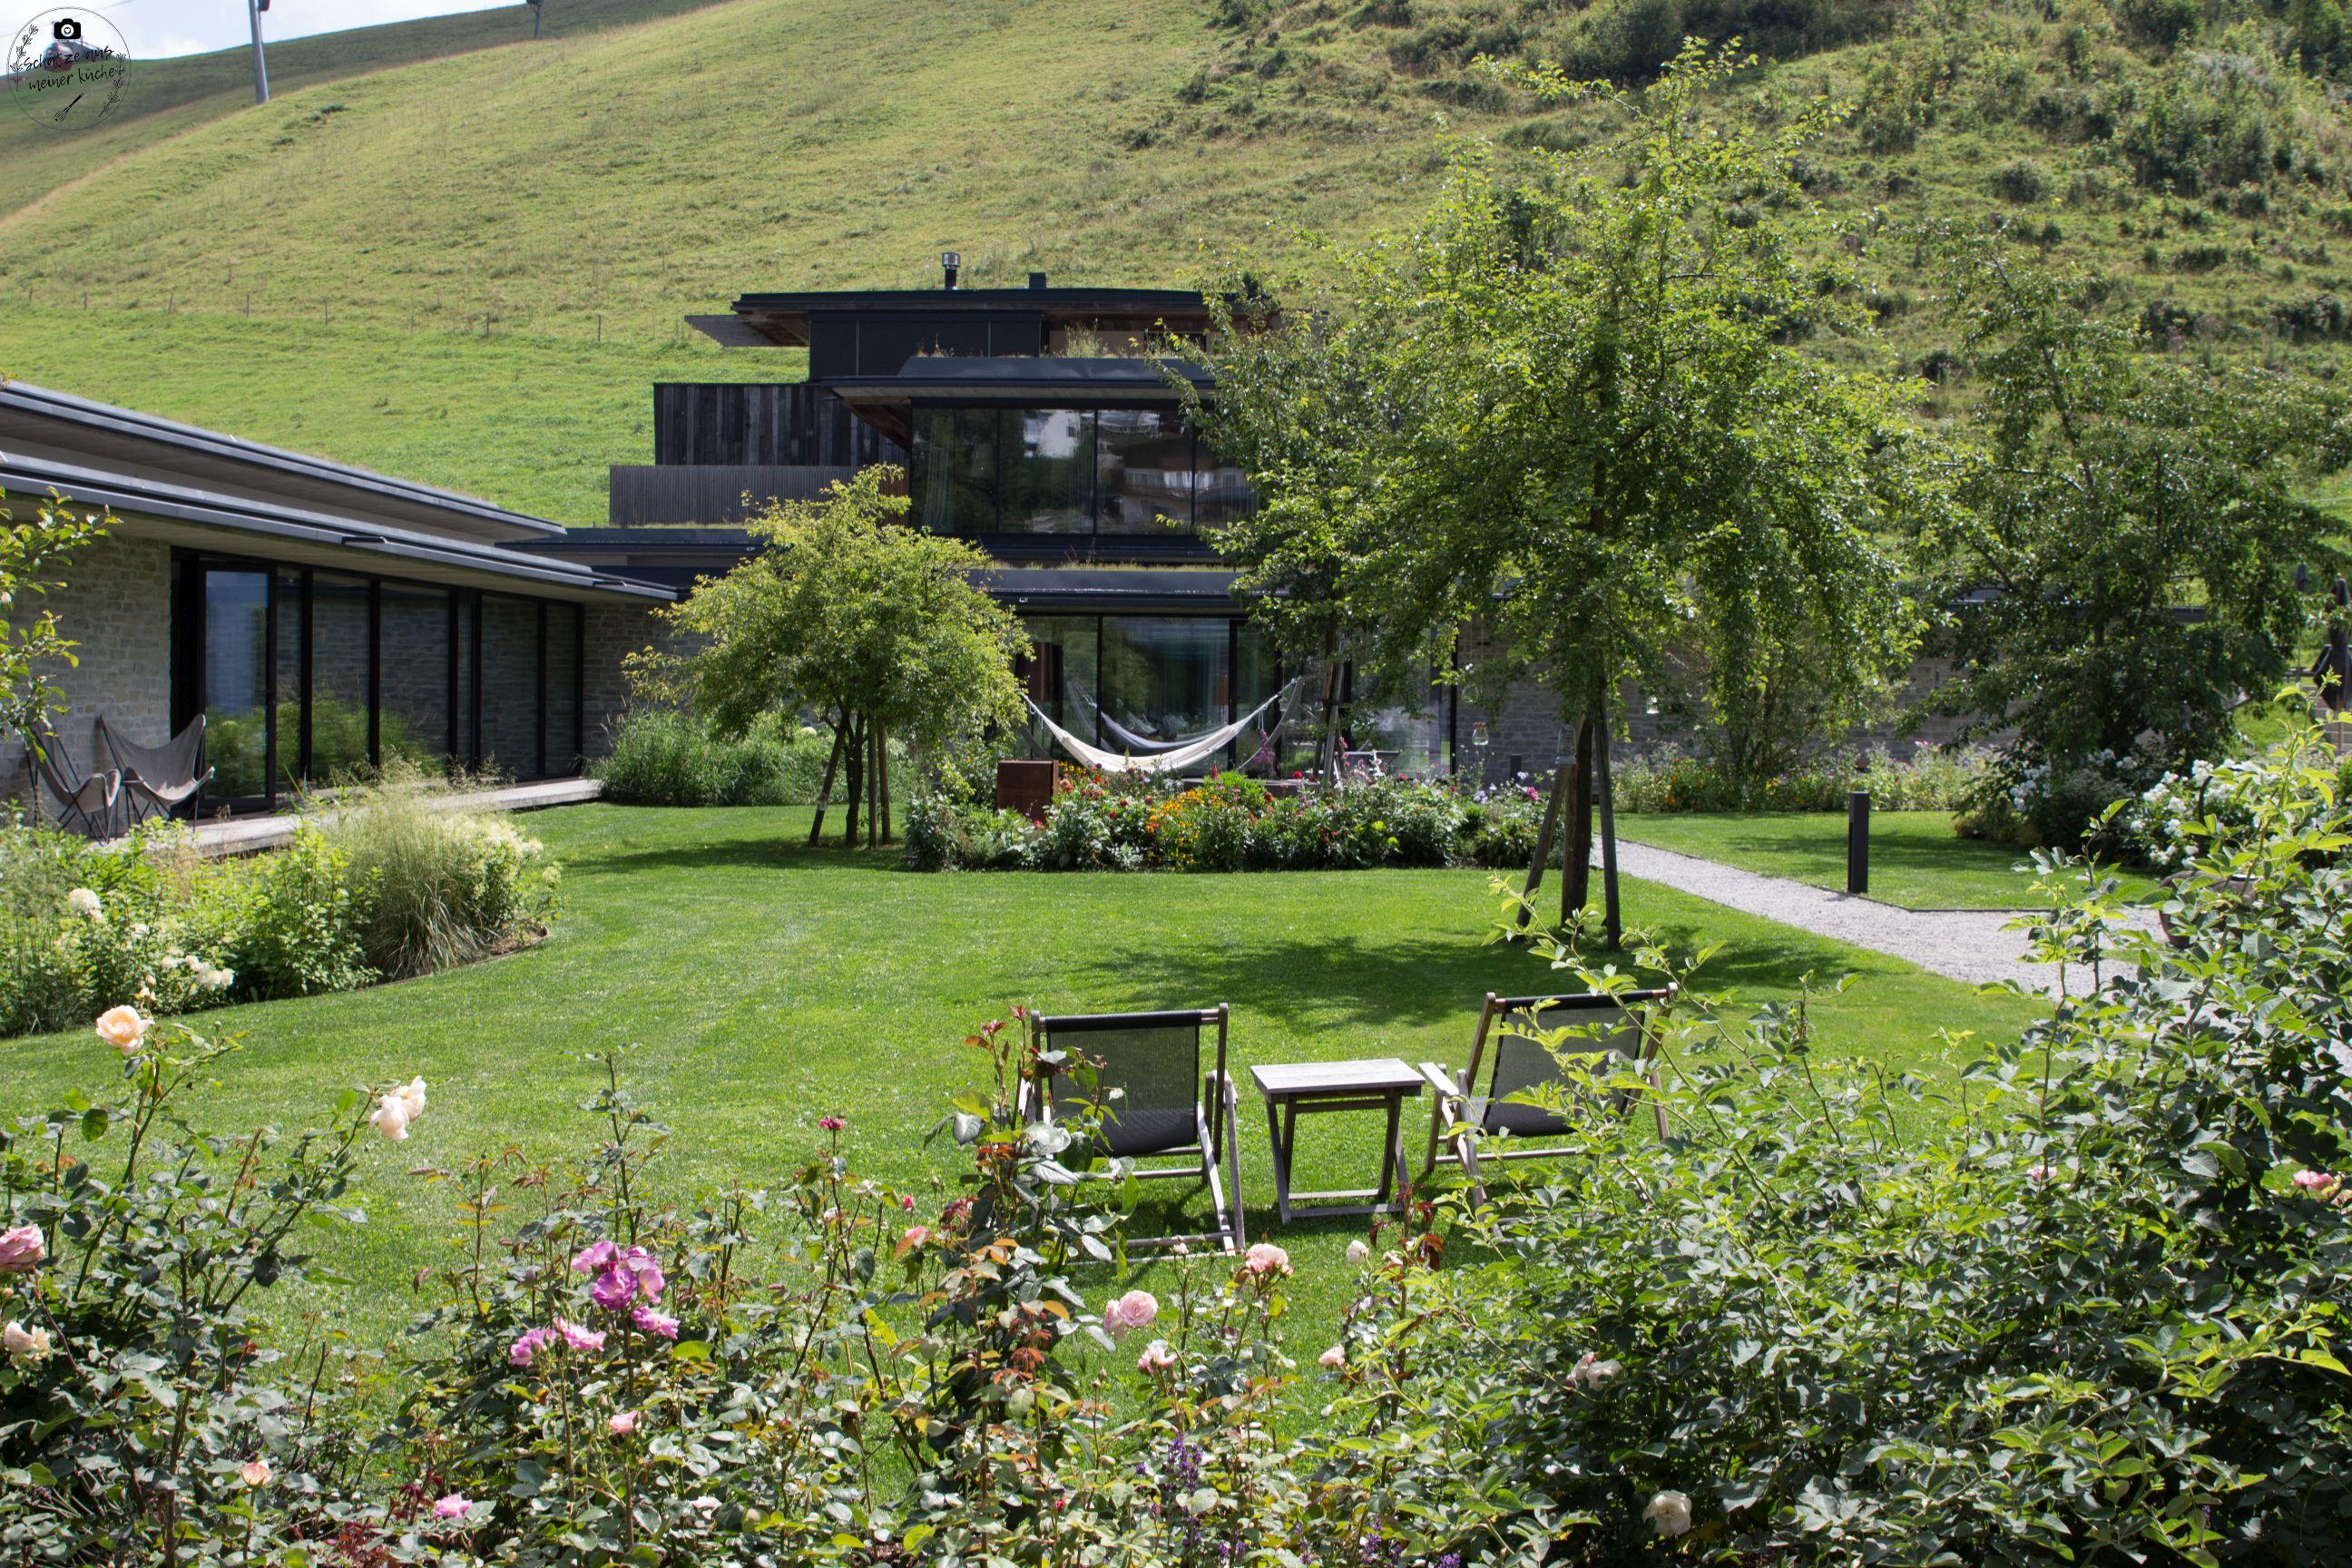 Wiesergut Spa Hotel Designhotel Innenhof Garten